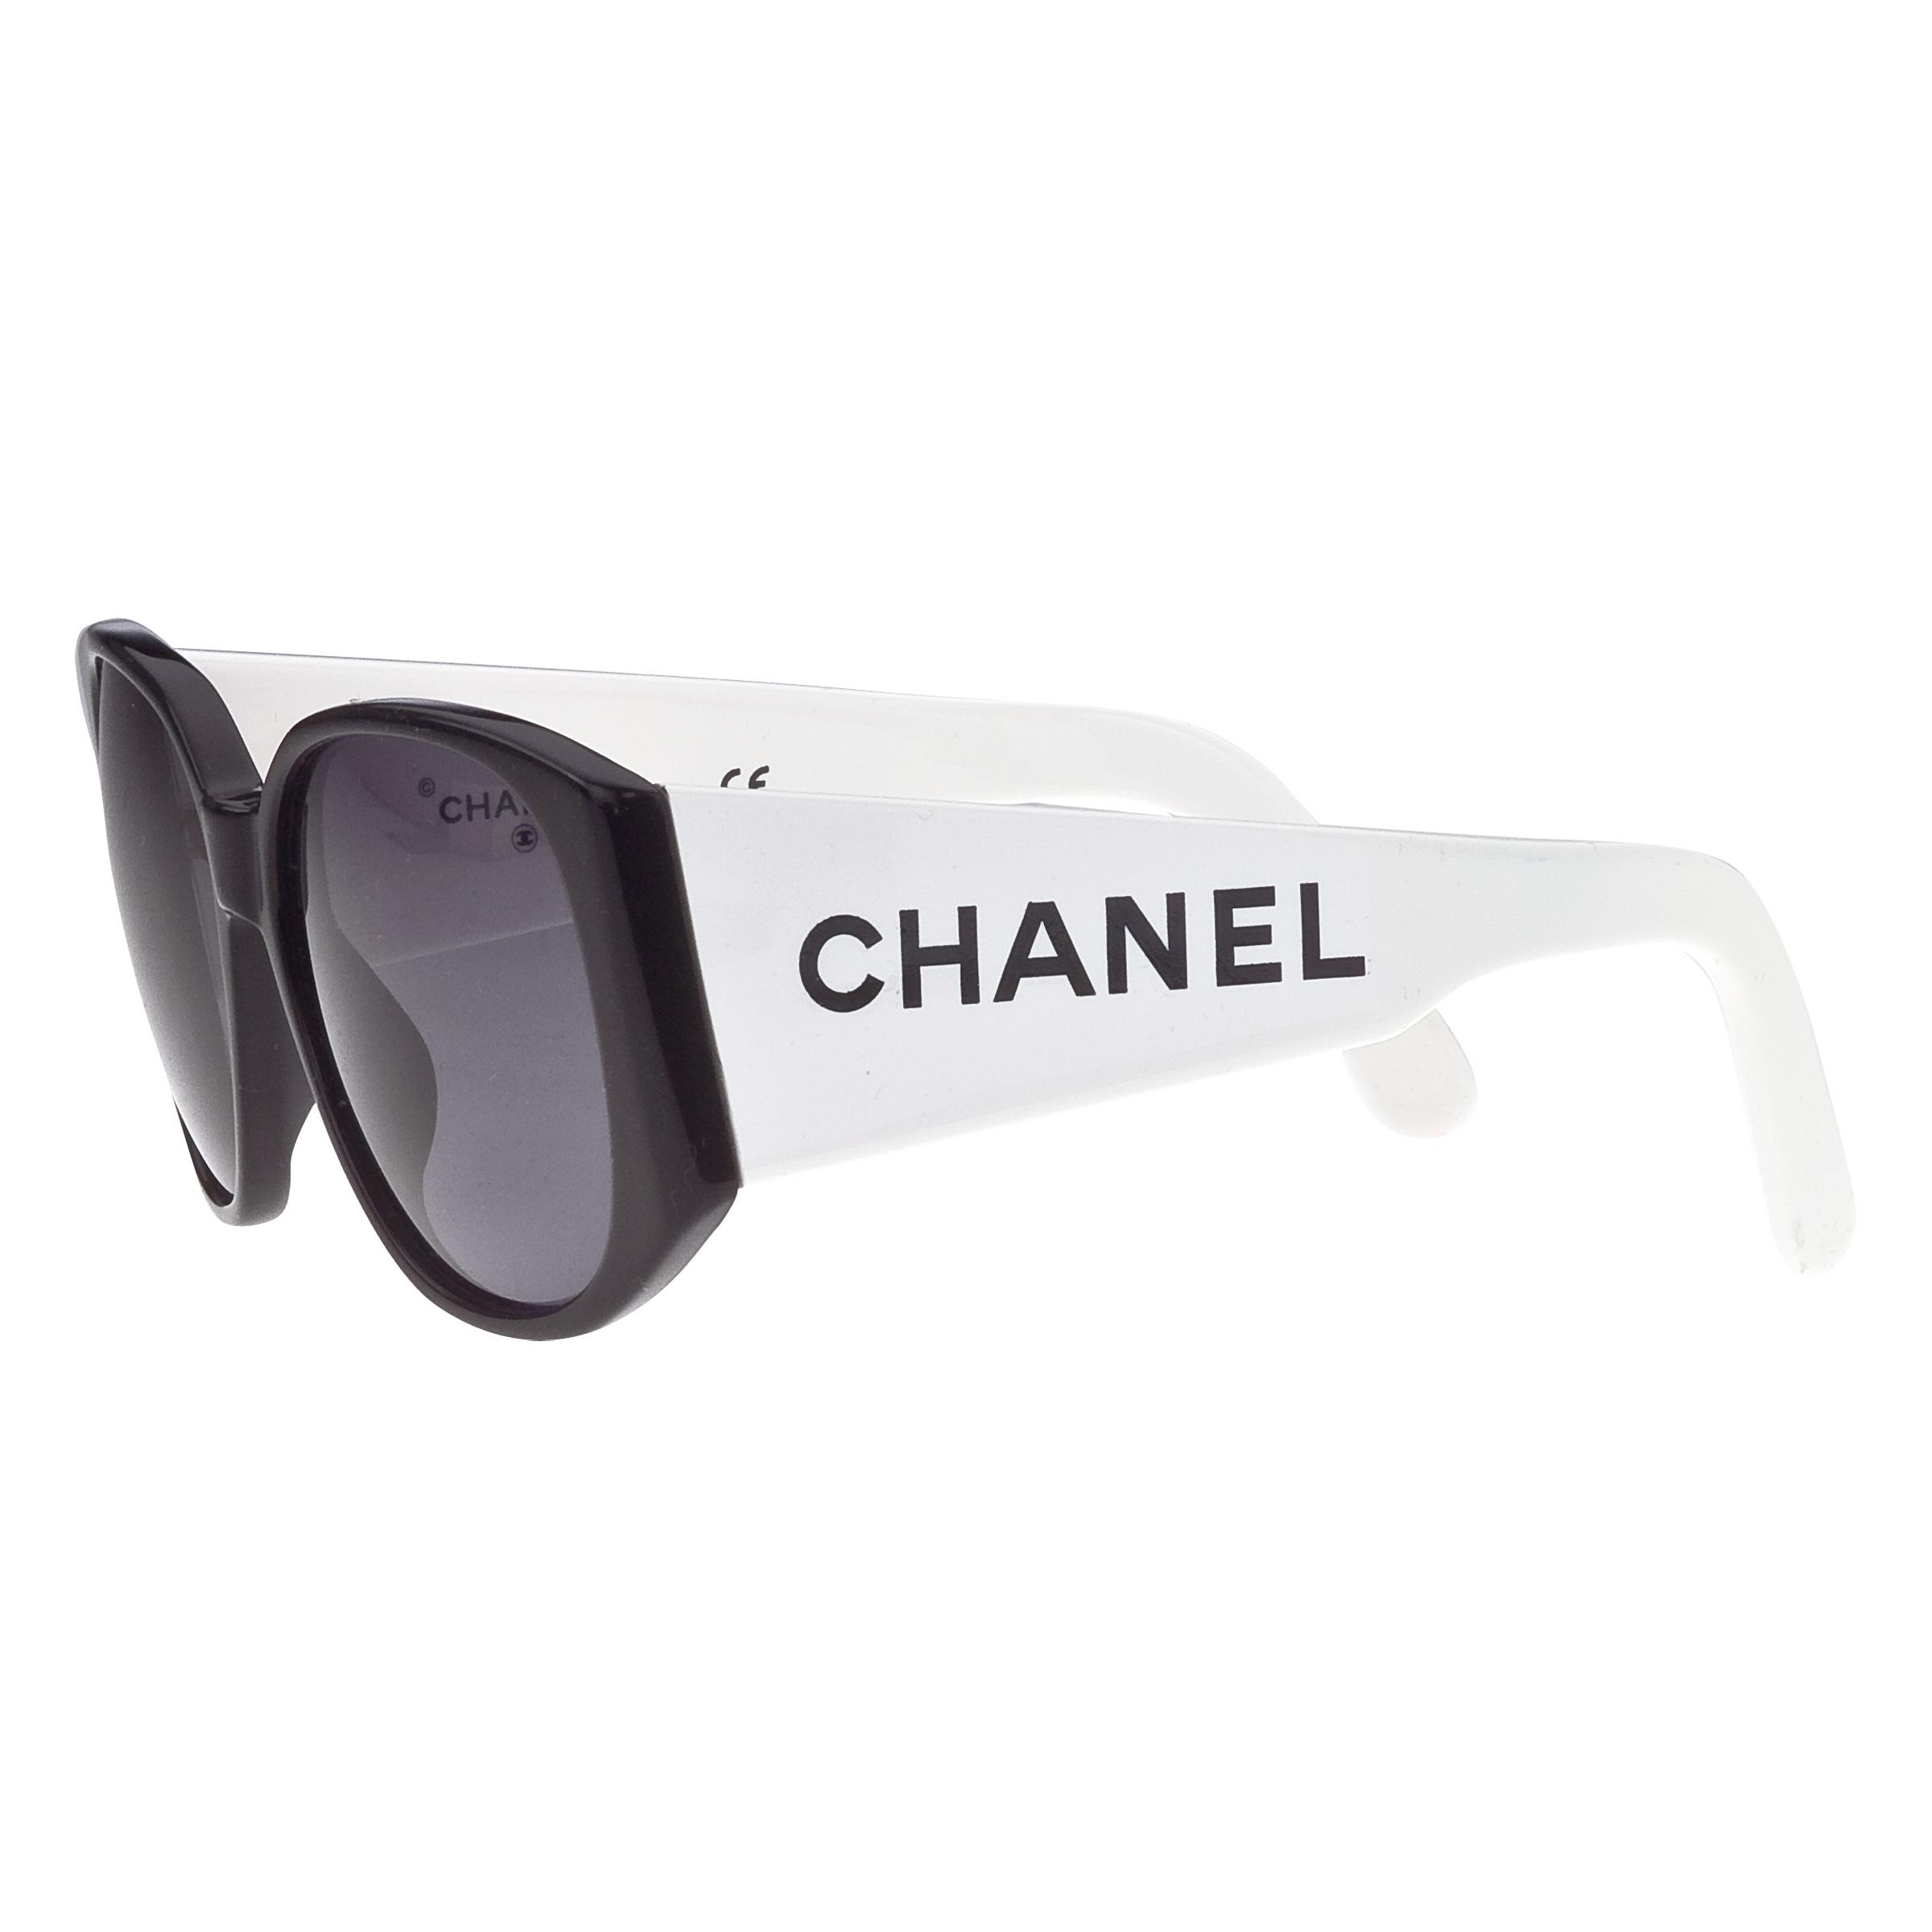 CHANEL BLACK AND WHITE LOGO SUNGLASSES 2